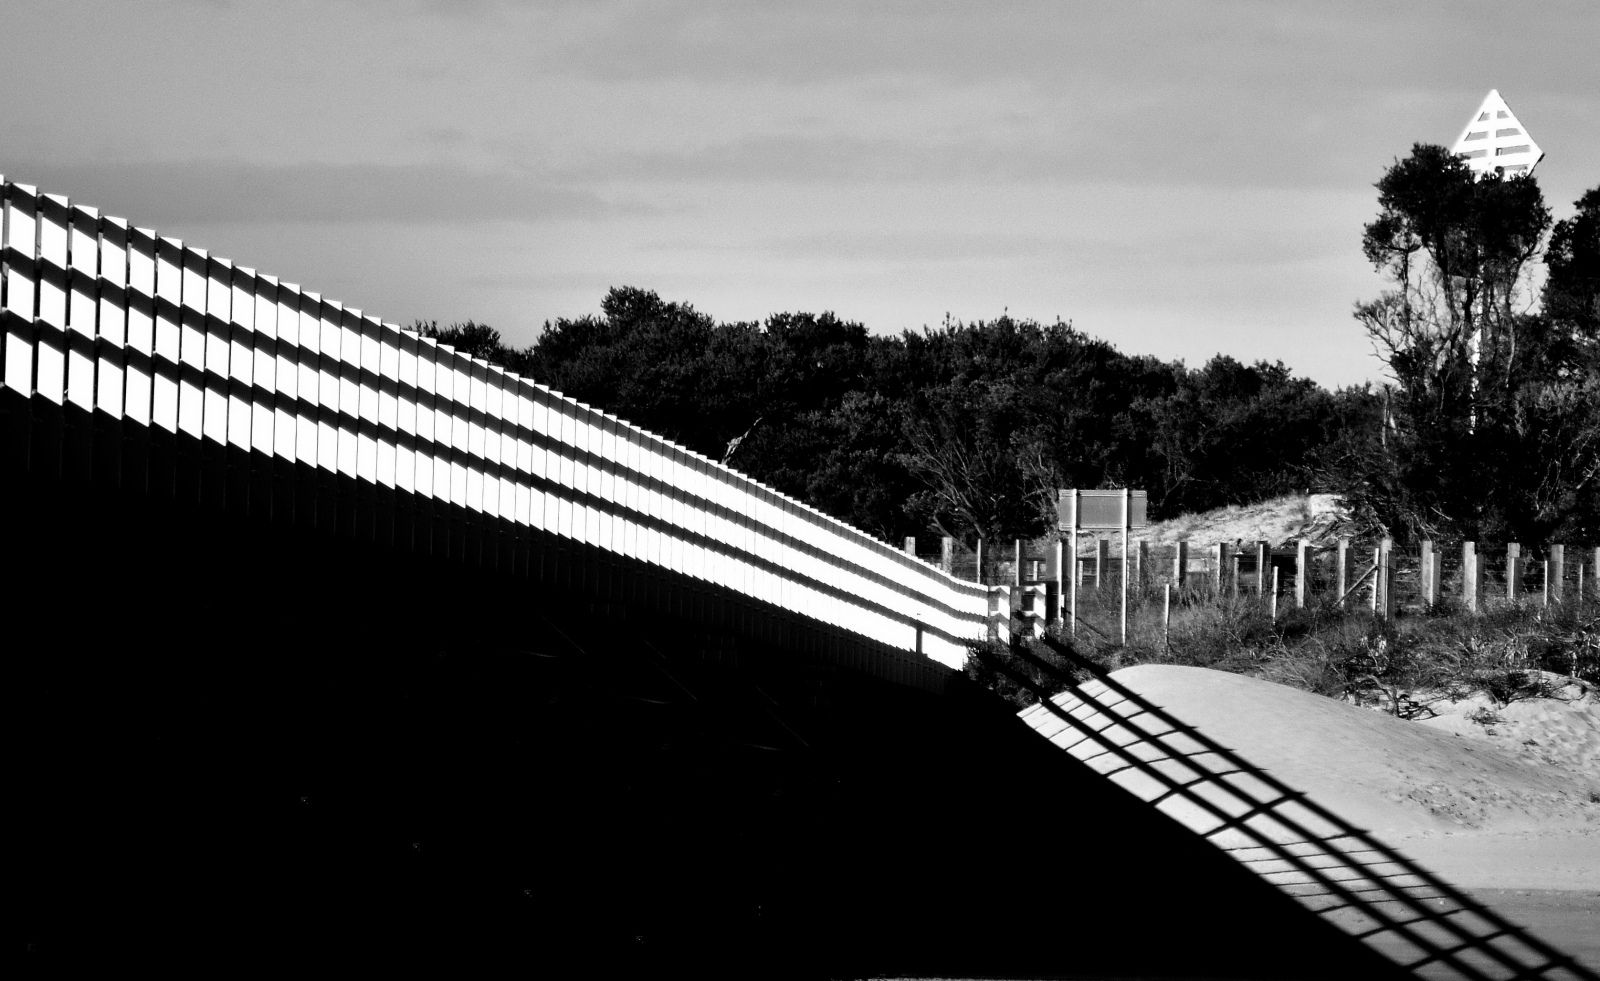 Barwon River bridge | by phunnyfotos